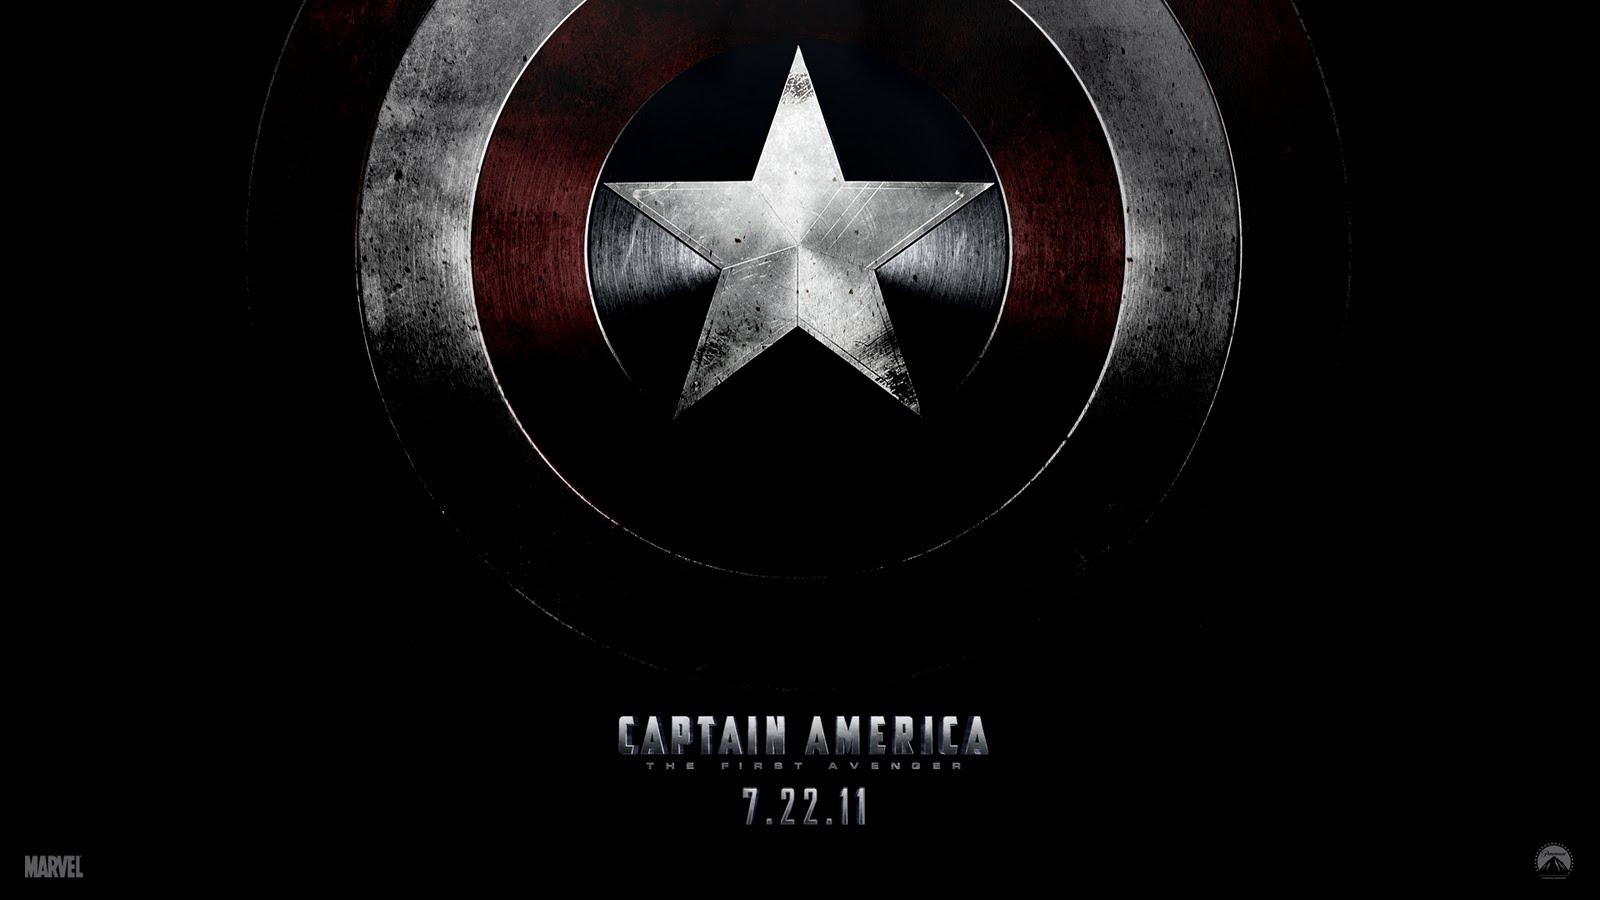 http://3.bp.blogspot.com/-3vREX3MfOEs/TjQ4NVbnotI/AAAAAAAAB40/XX1vq3uLmu0/s1600/Captain_America%2B_The_First_Avenger_Wallpaper_8_1024.jpg